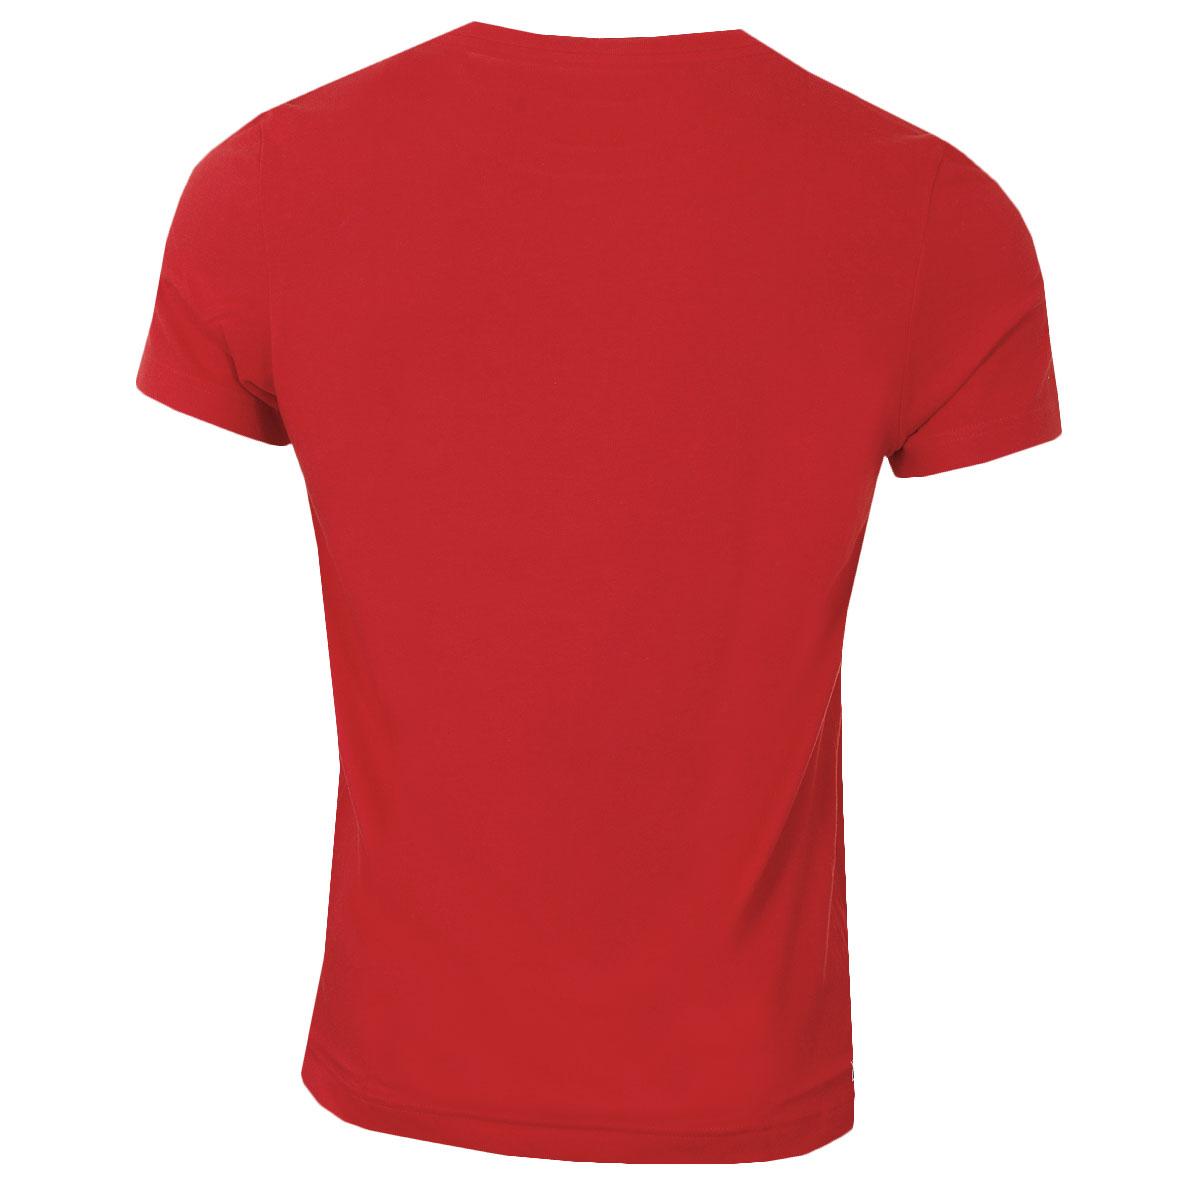 Lacoste-Mens-Oversized-Crocodile-Ultra-Dry-Cotton-Blend-T-Shirt-30-OFF-RRP thumbnail 13